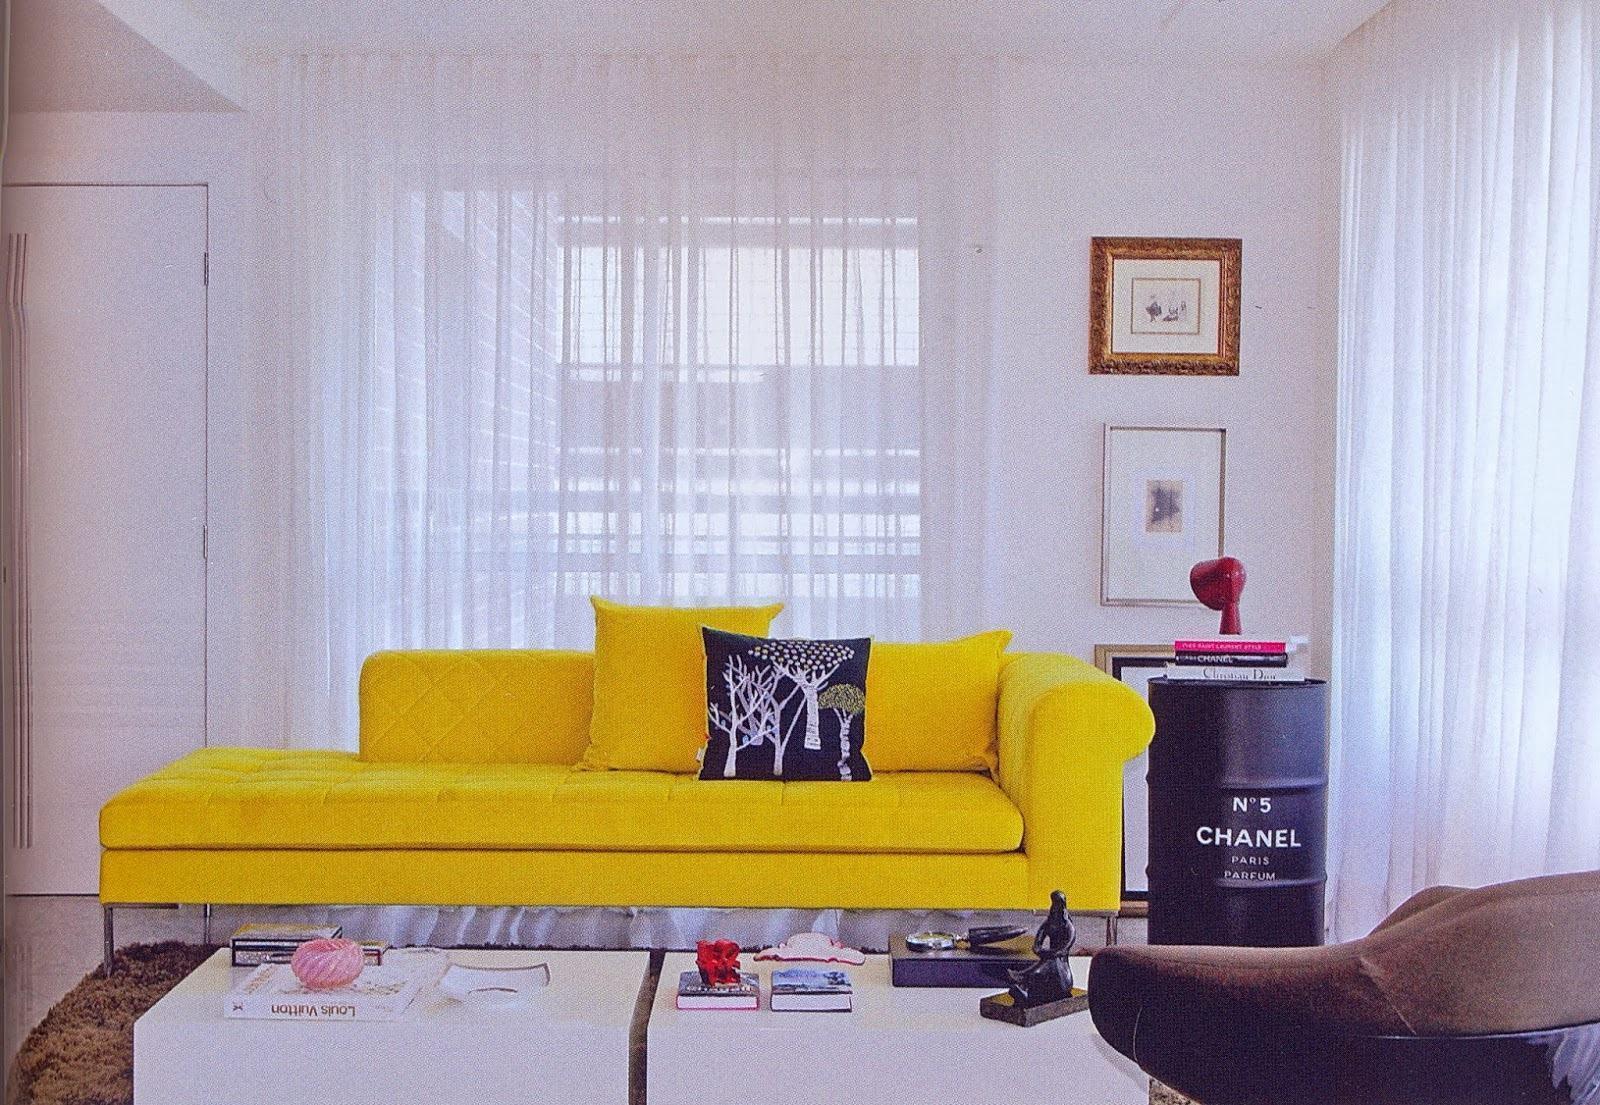 60 Sof S Pequenos Para Salas De Estar Fotos Lindas -> Estofados De Canto Confortavel Para Sala Pequena